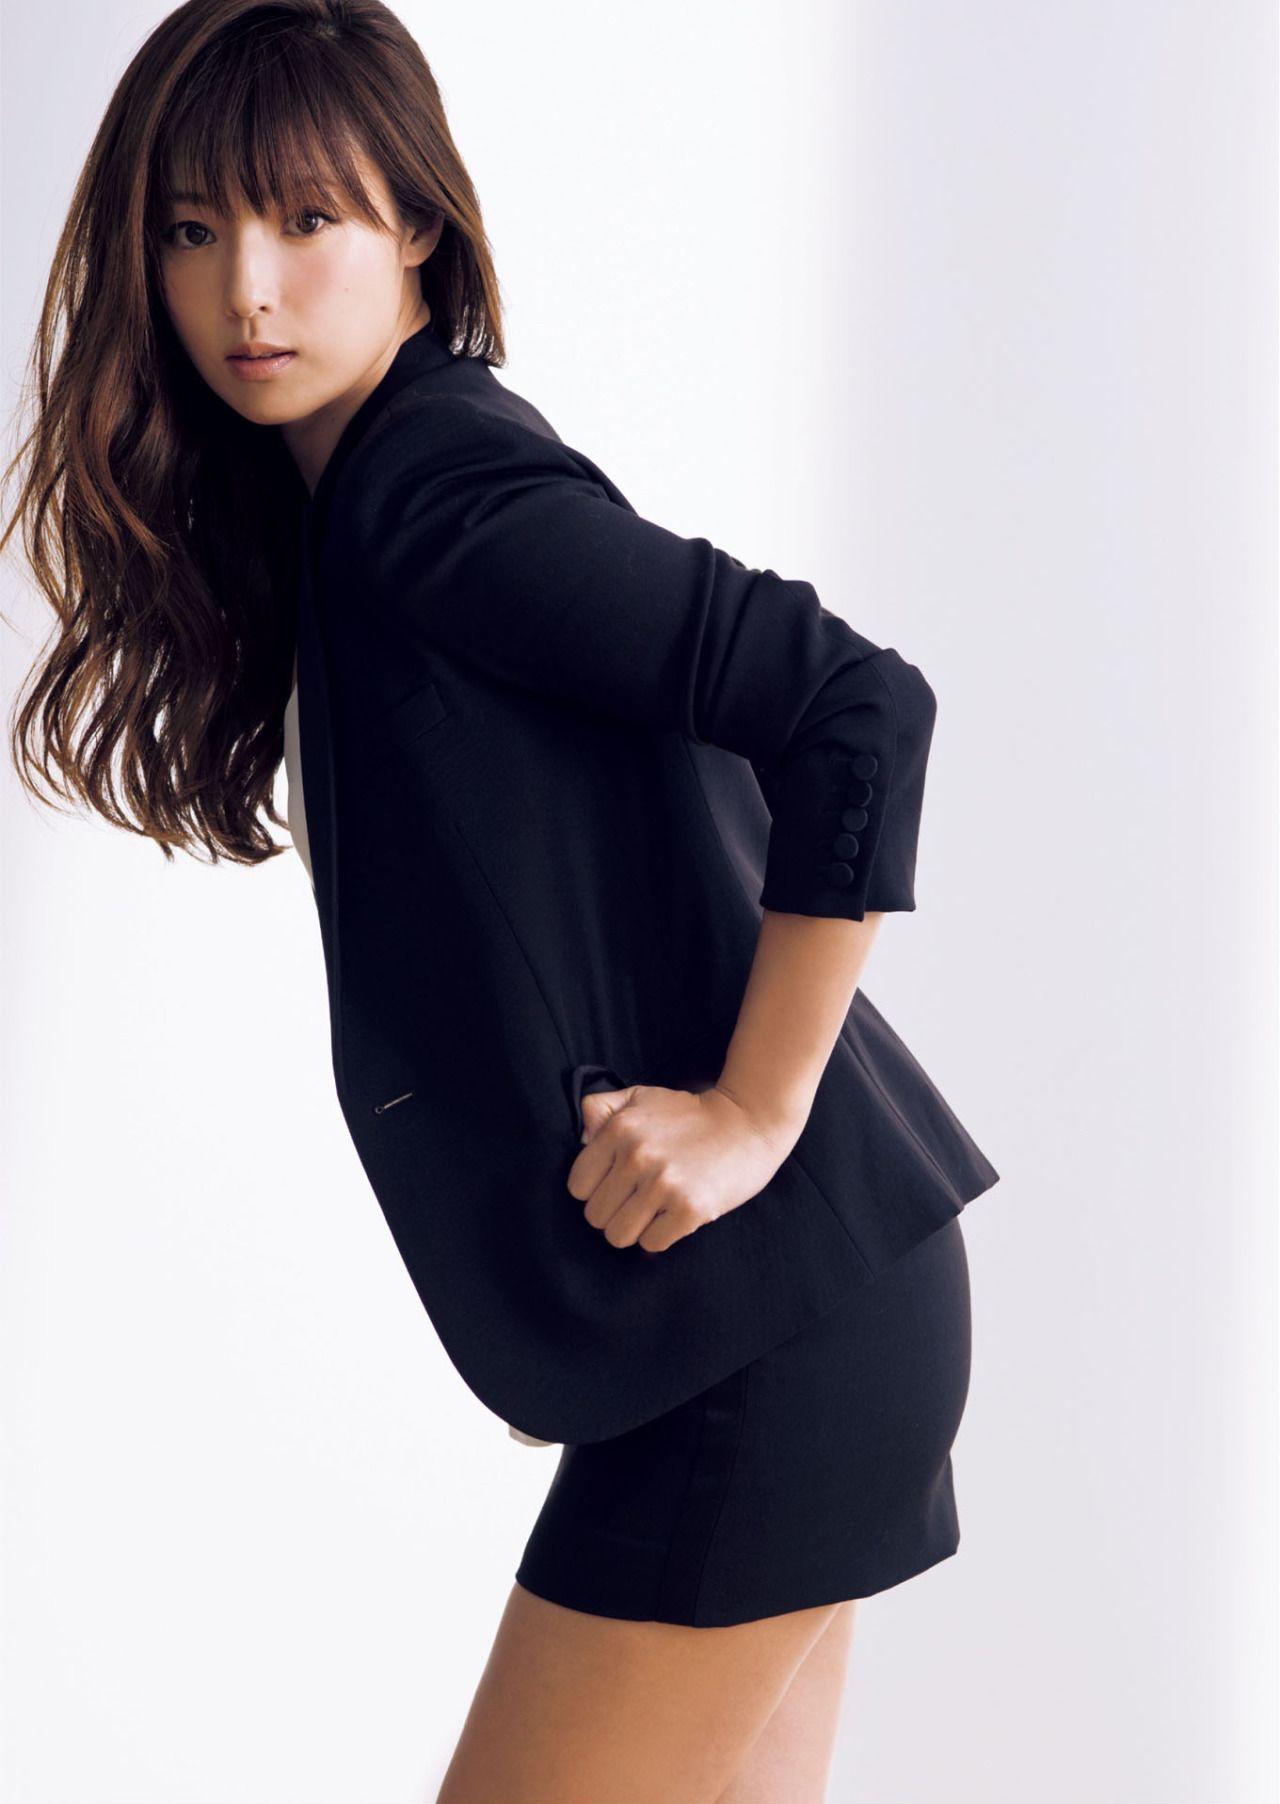 OLコスチュームの深田恭子 4